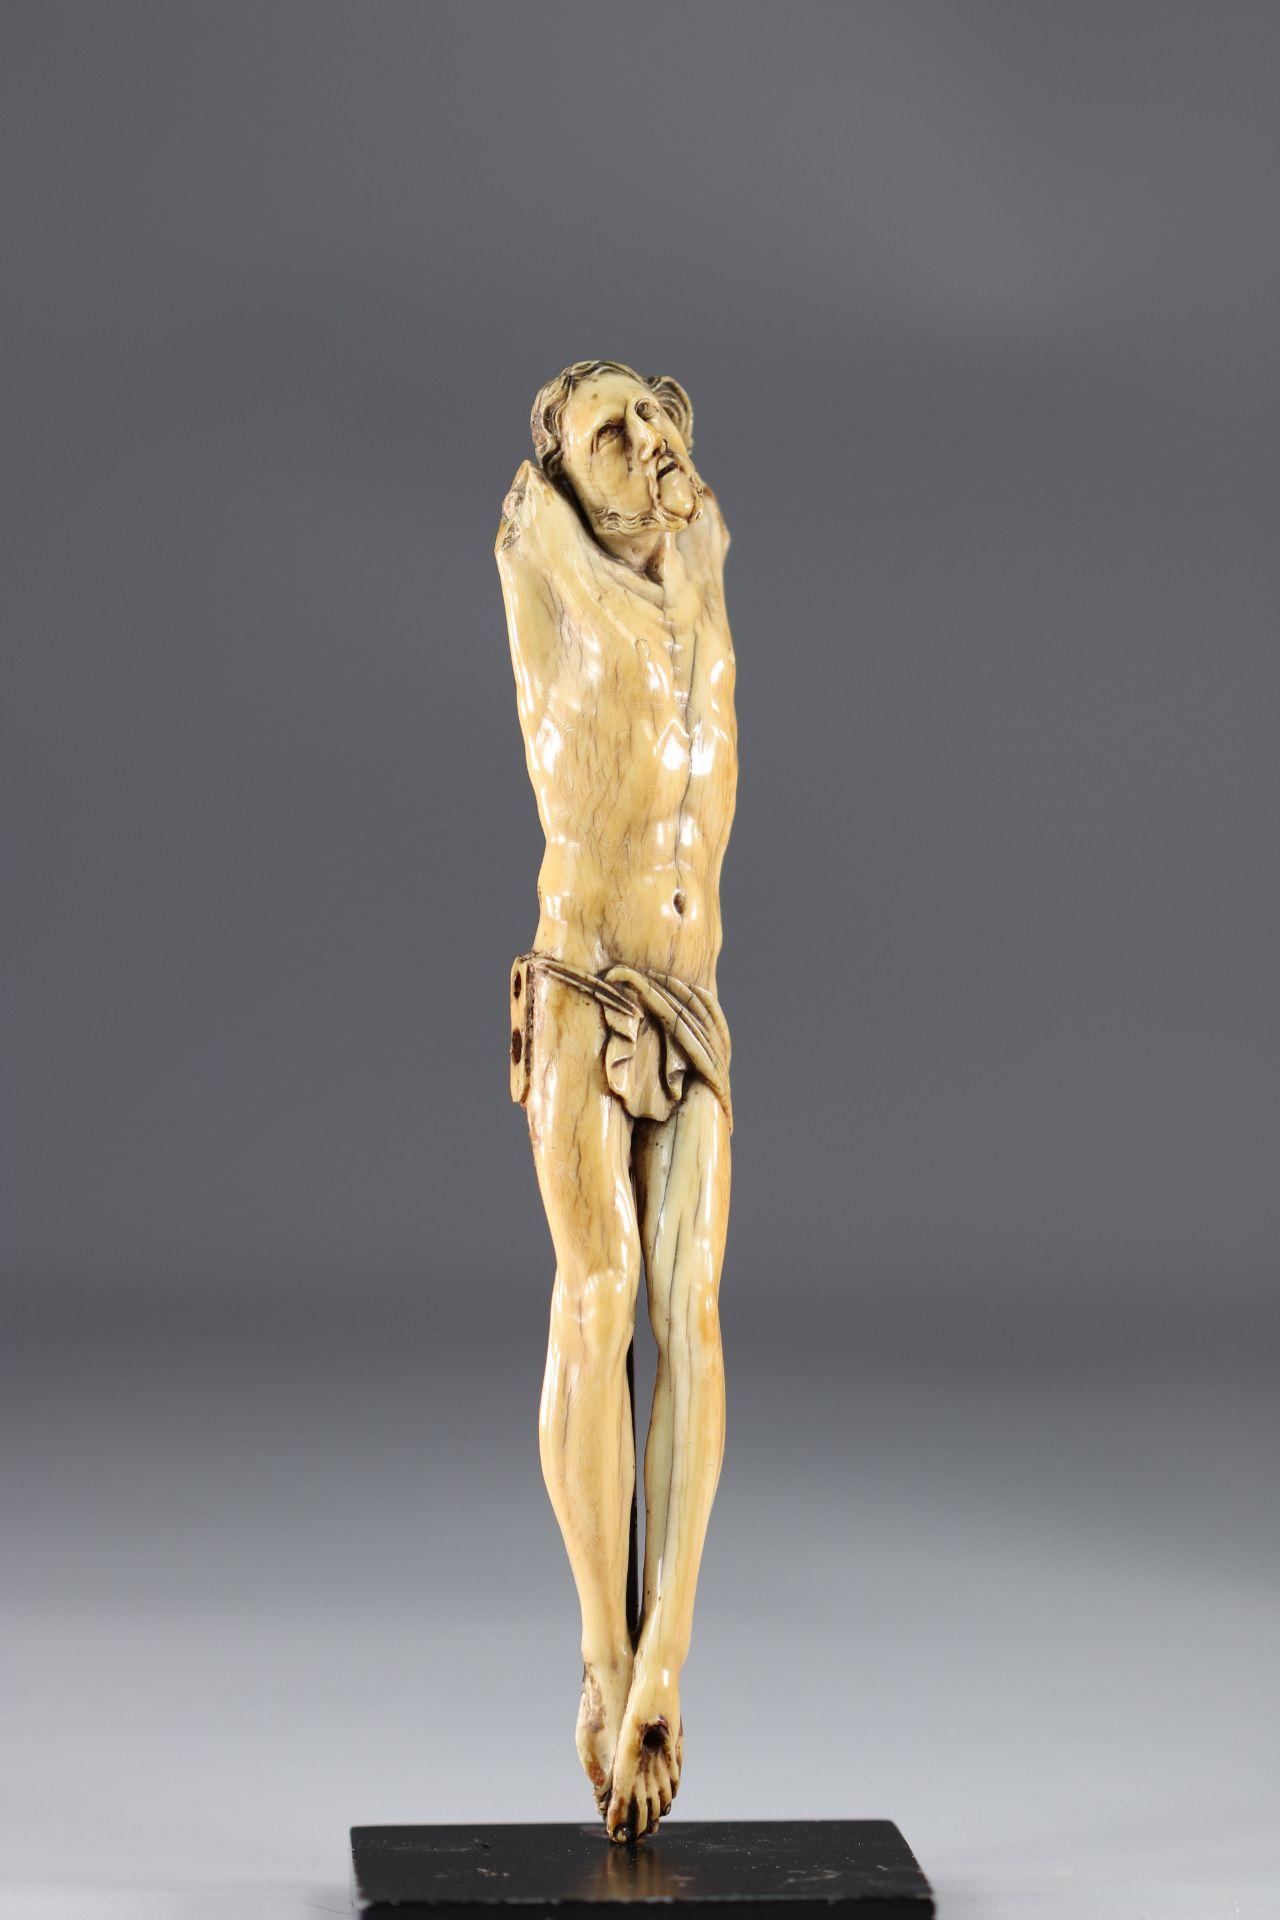 Corpus Christi - Ivory - arm missing